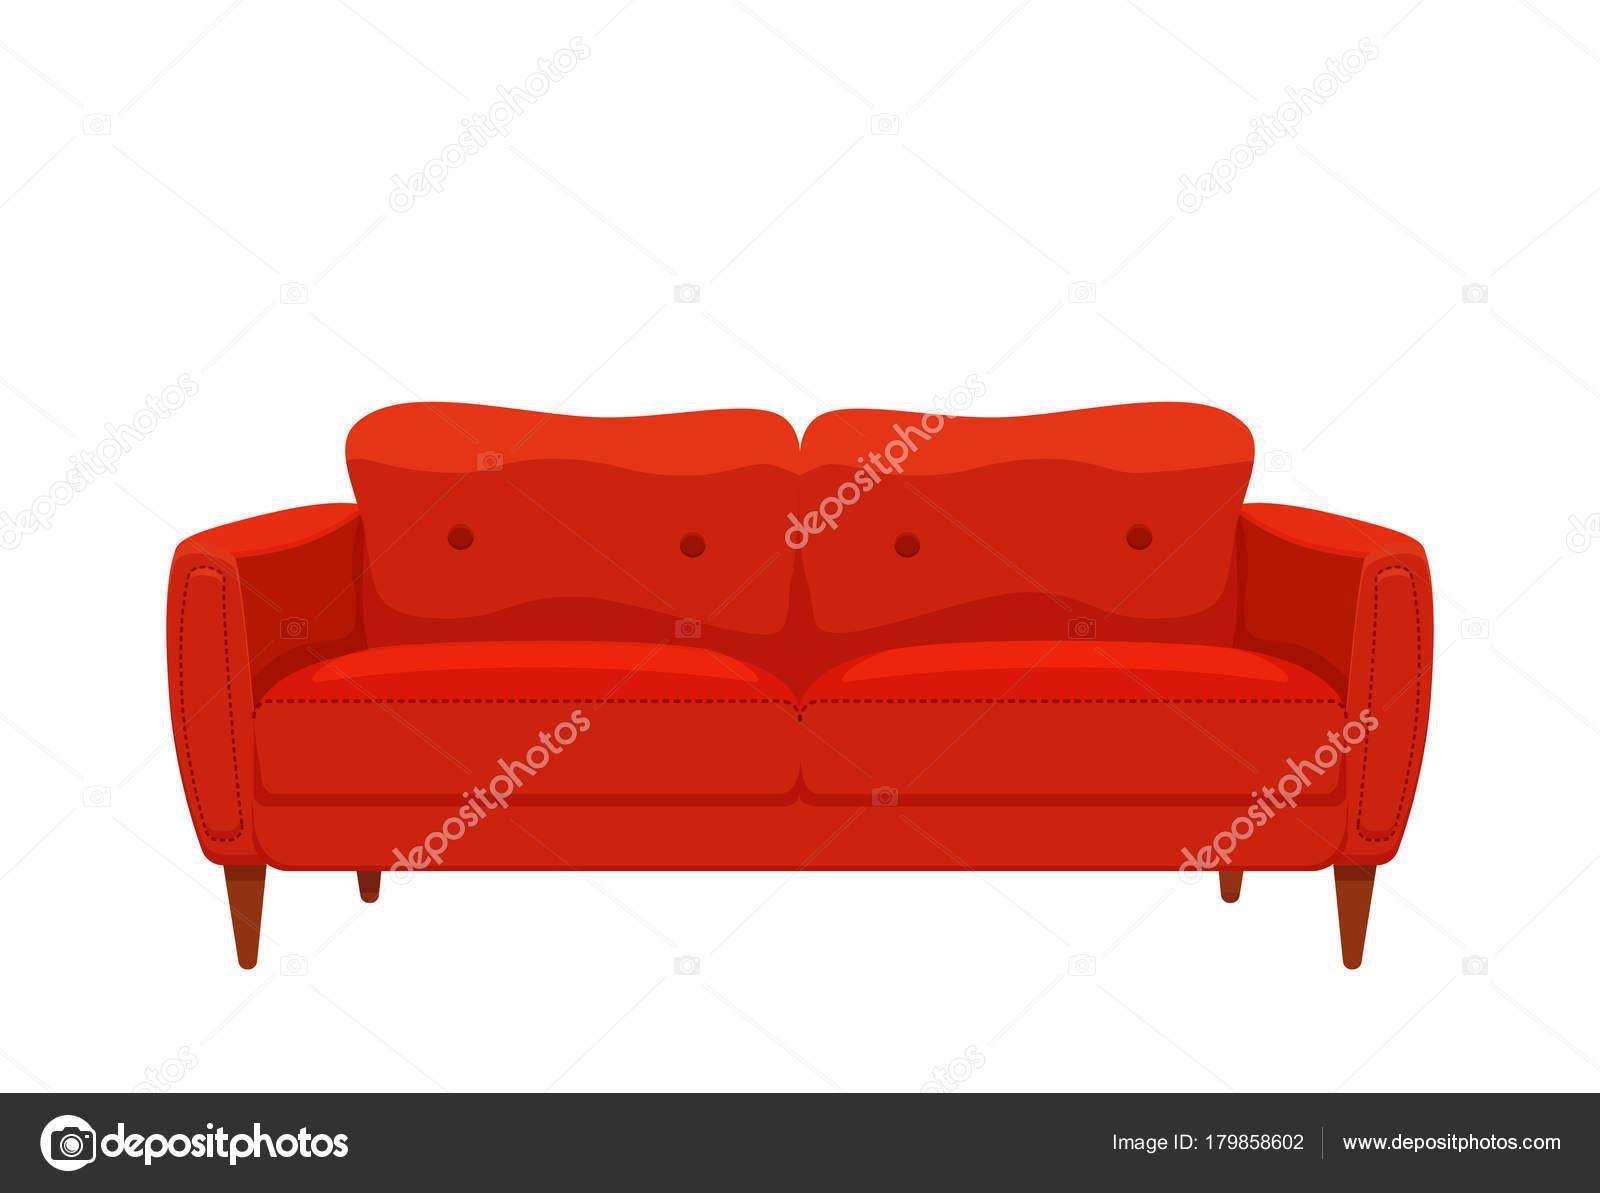 Sillones Coloridos.Animado Sofa Animados Ilustracion De Dibujos Animados